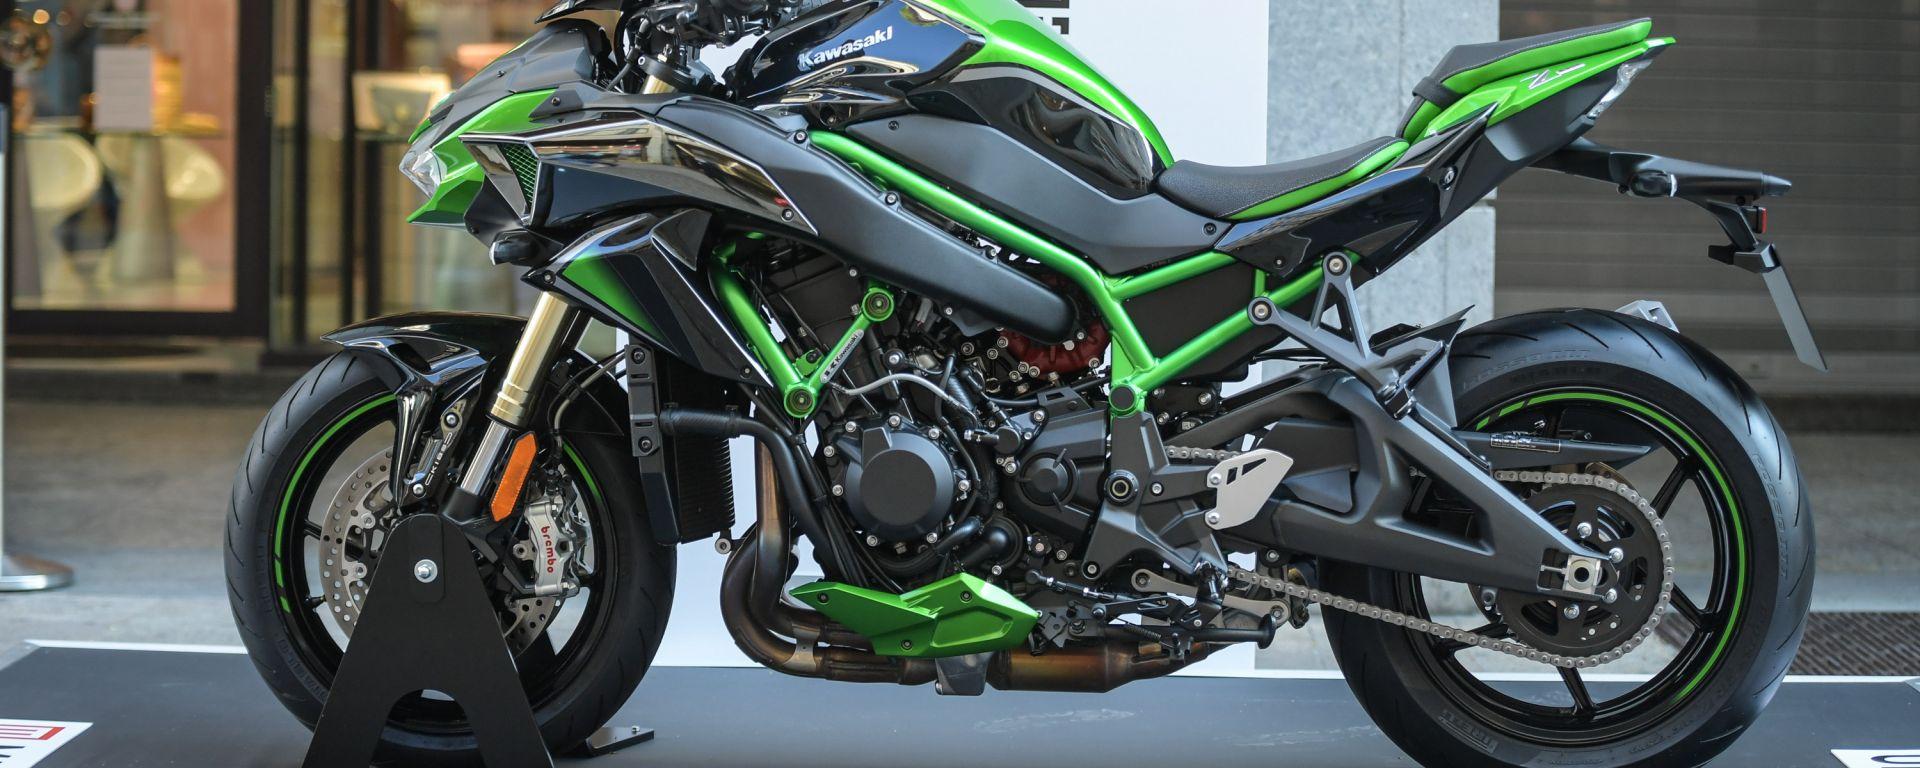 Kawasaki Z H2 SE, MIMO 2021